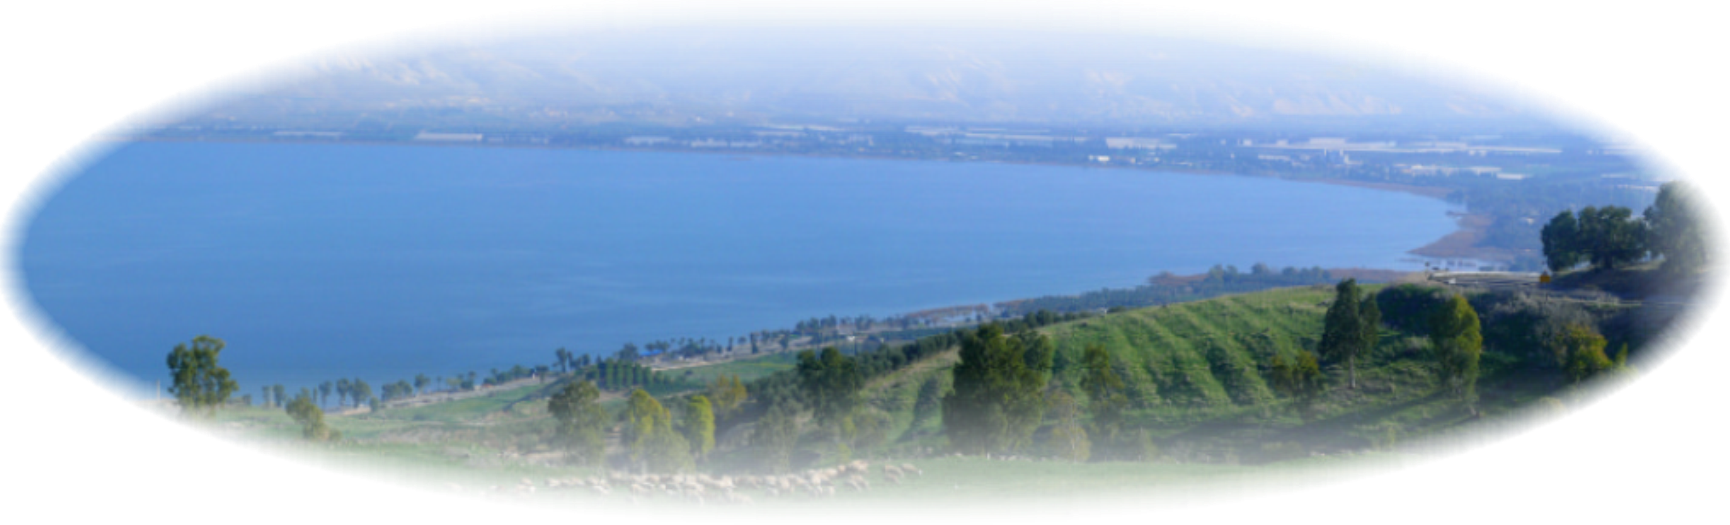 Ozero-Kinnereth-ili-Galilejskoe-more